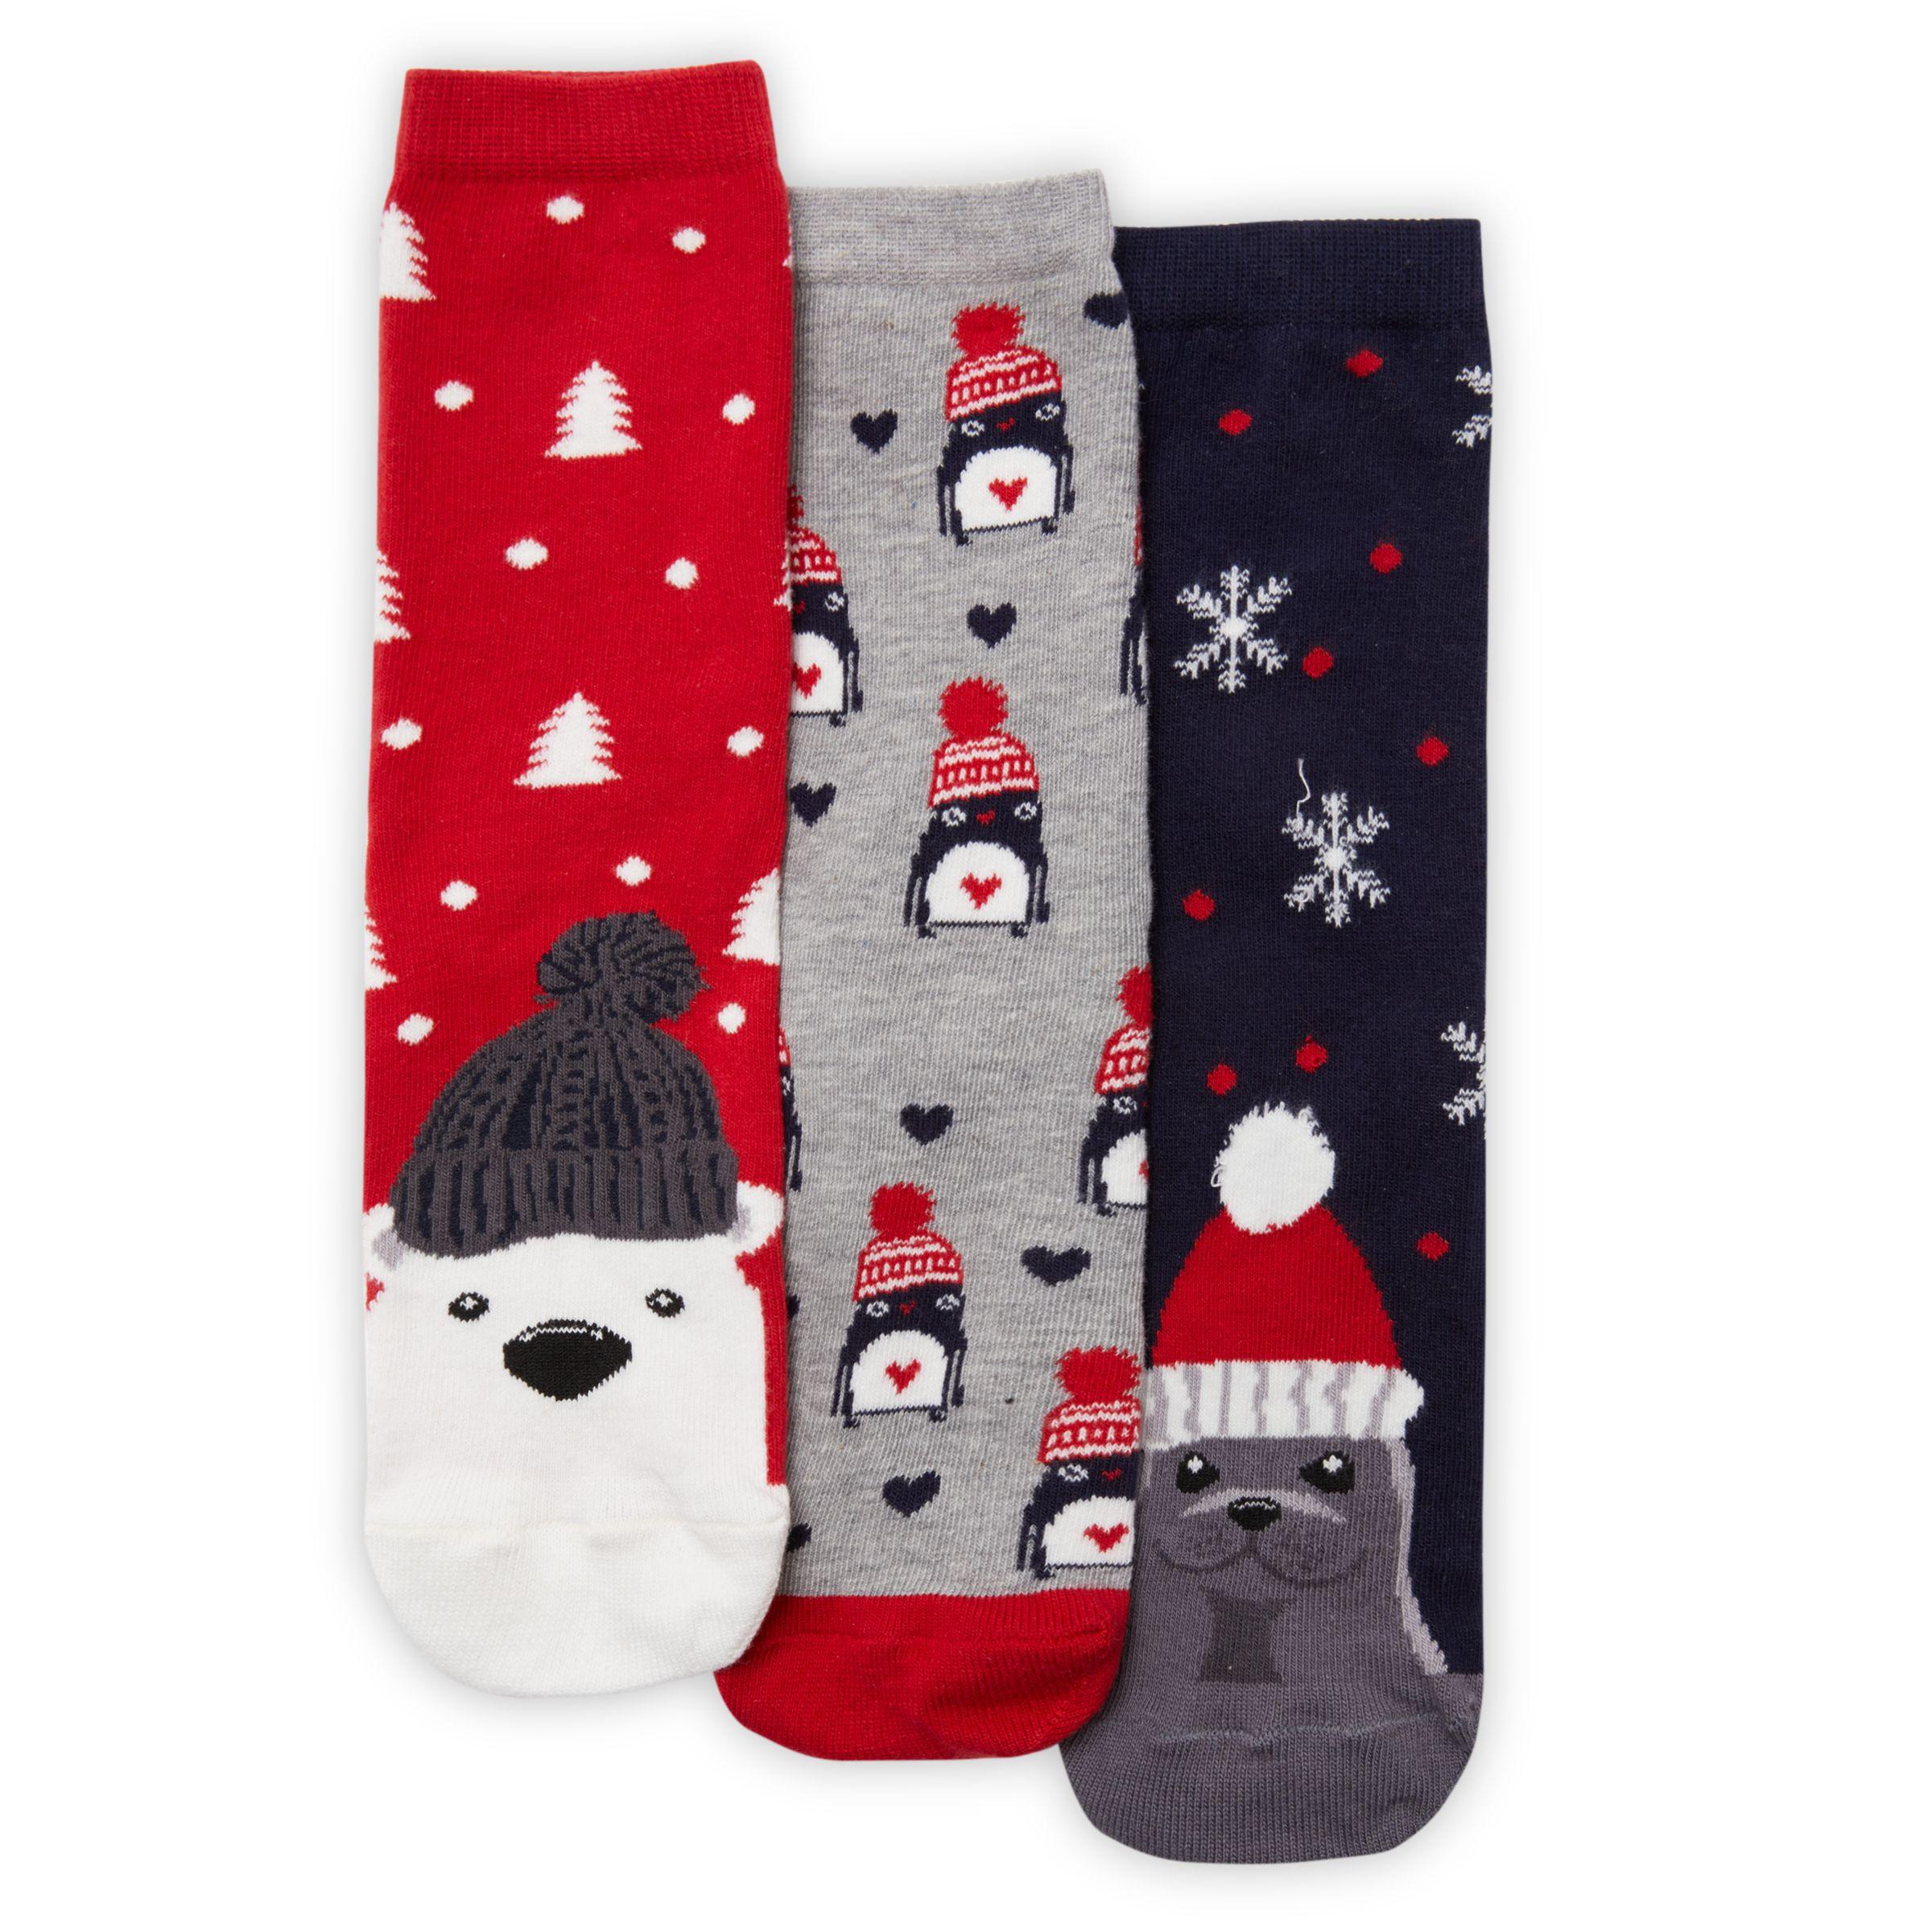 3pak baby babies girls girly socks pink white grey 0-0 0-2.5 3-5.5 cotton rich